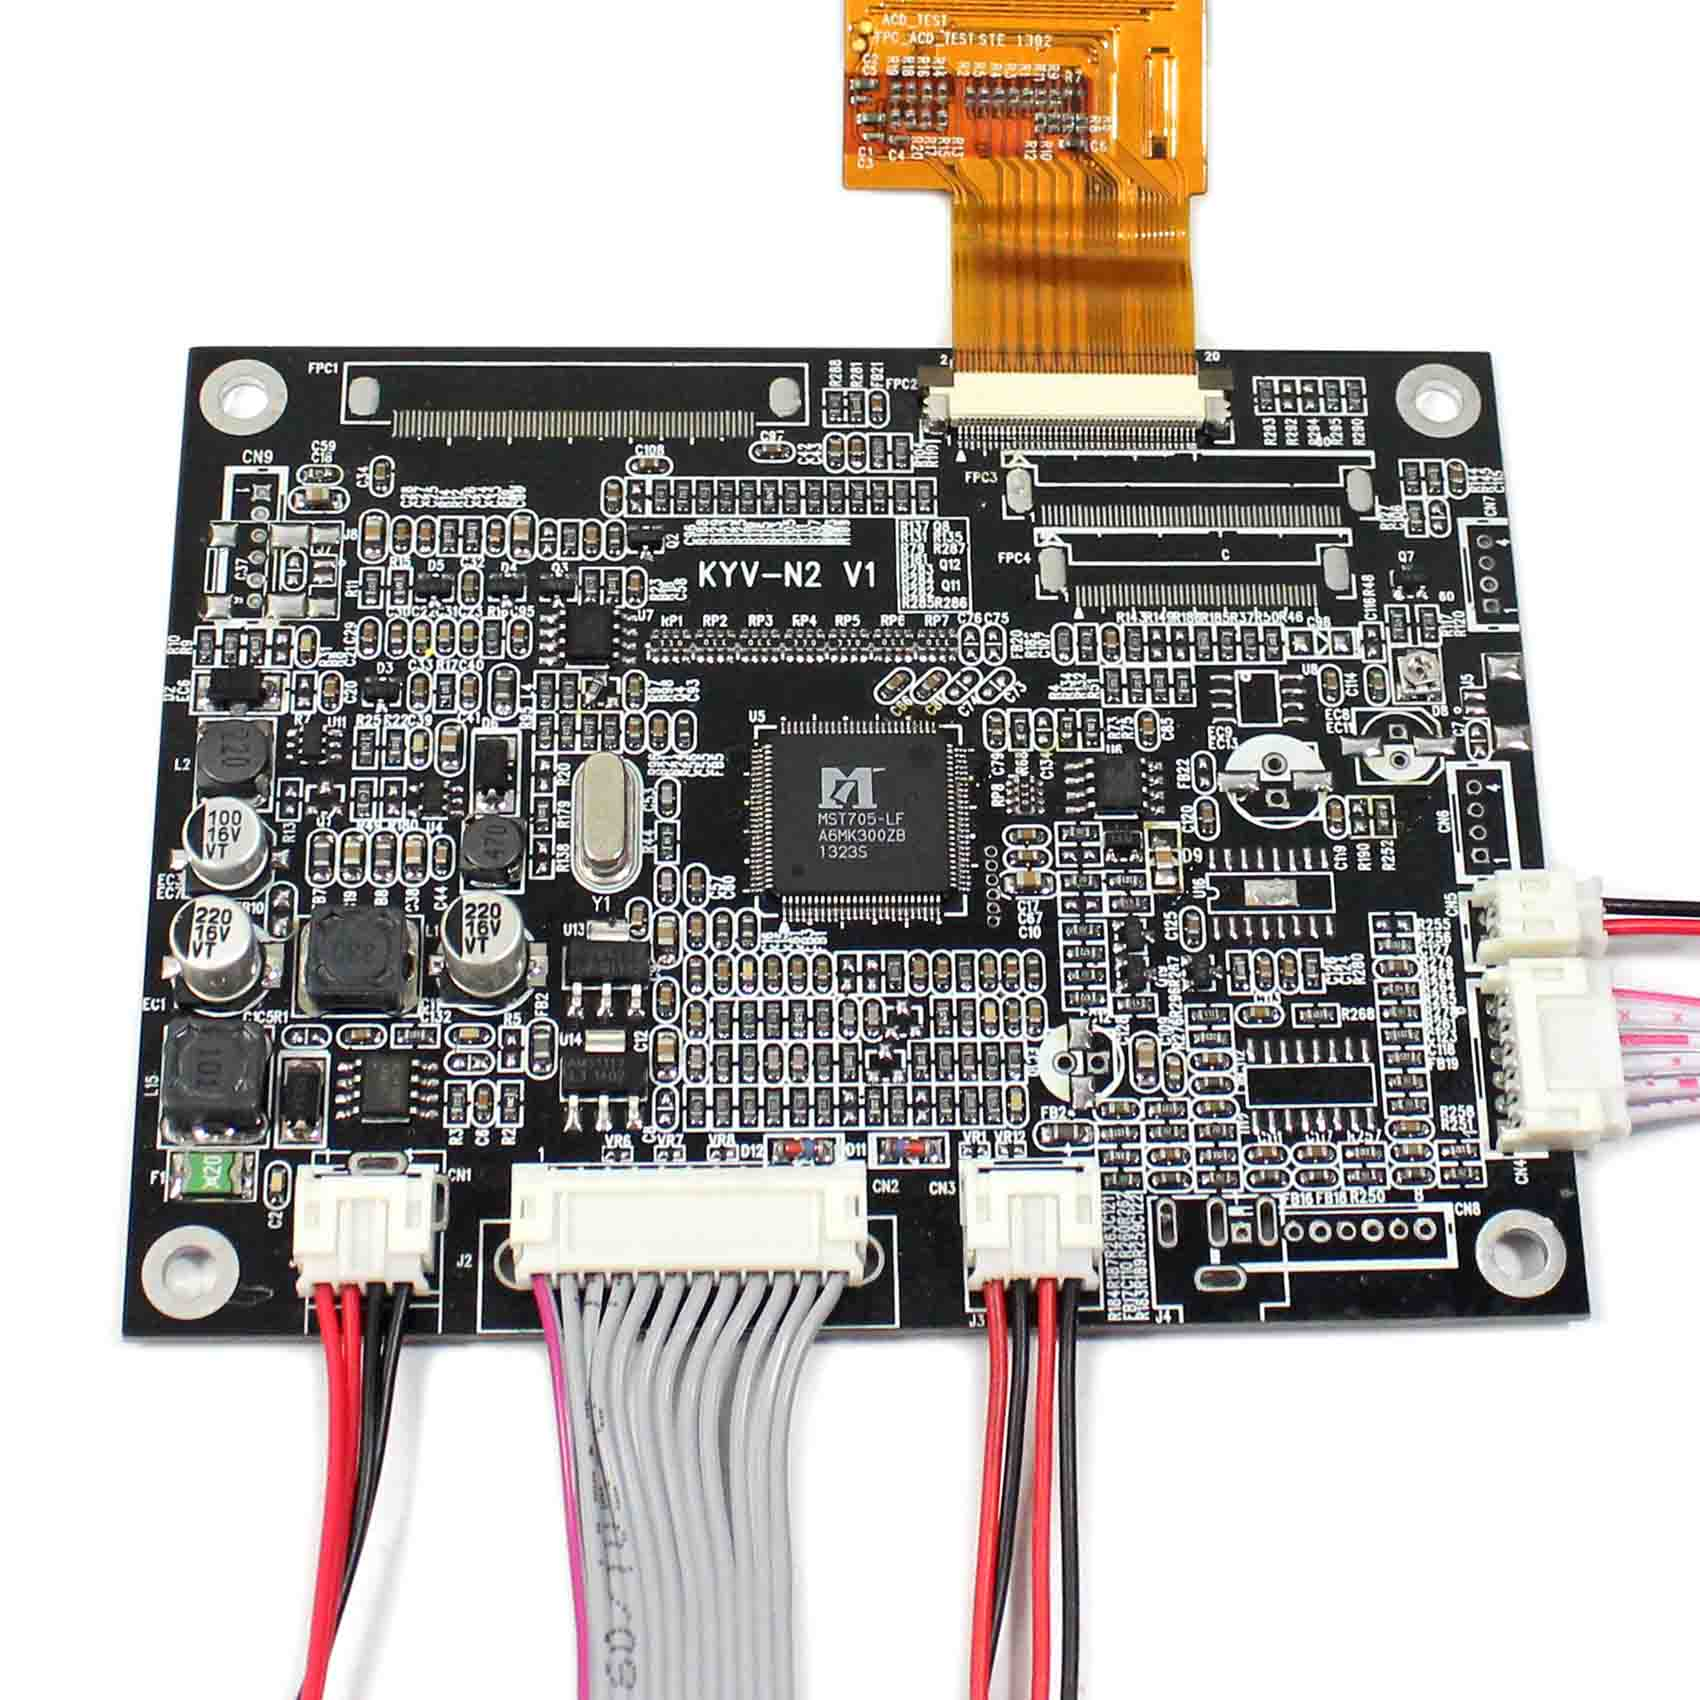 8inch IPS LCD Screen HJ080IA-01E 1024x768 VGA AV LCD Controller Board Reversing